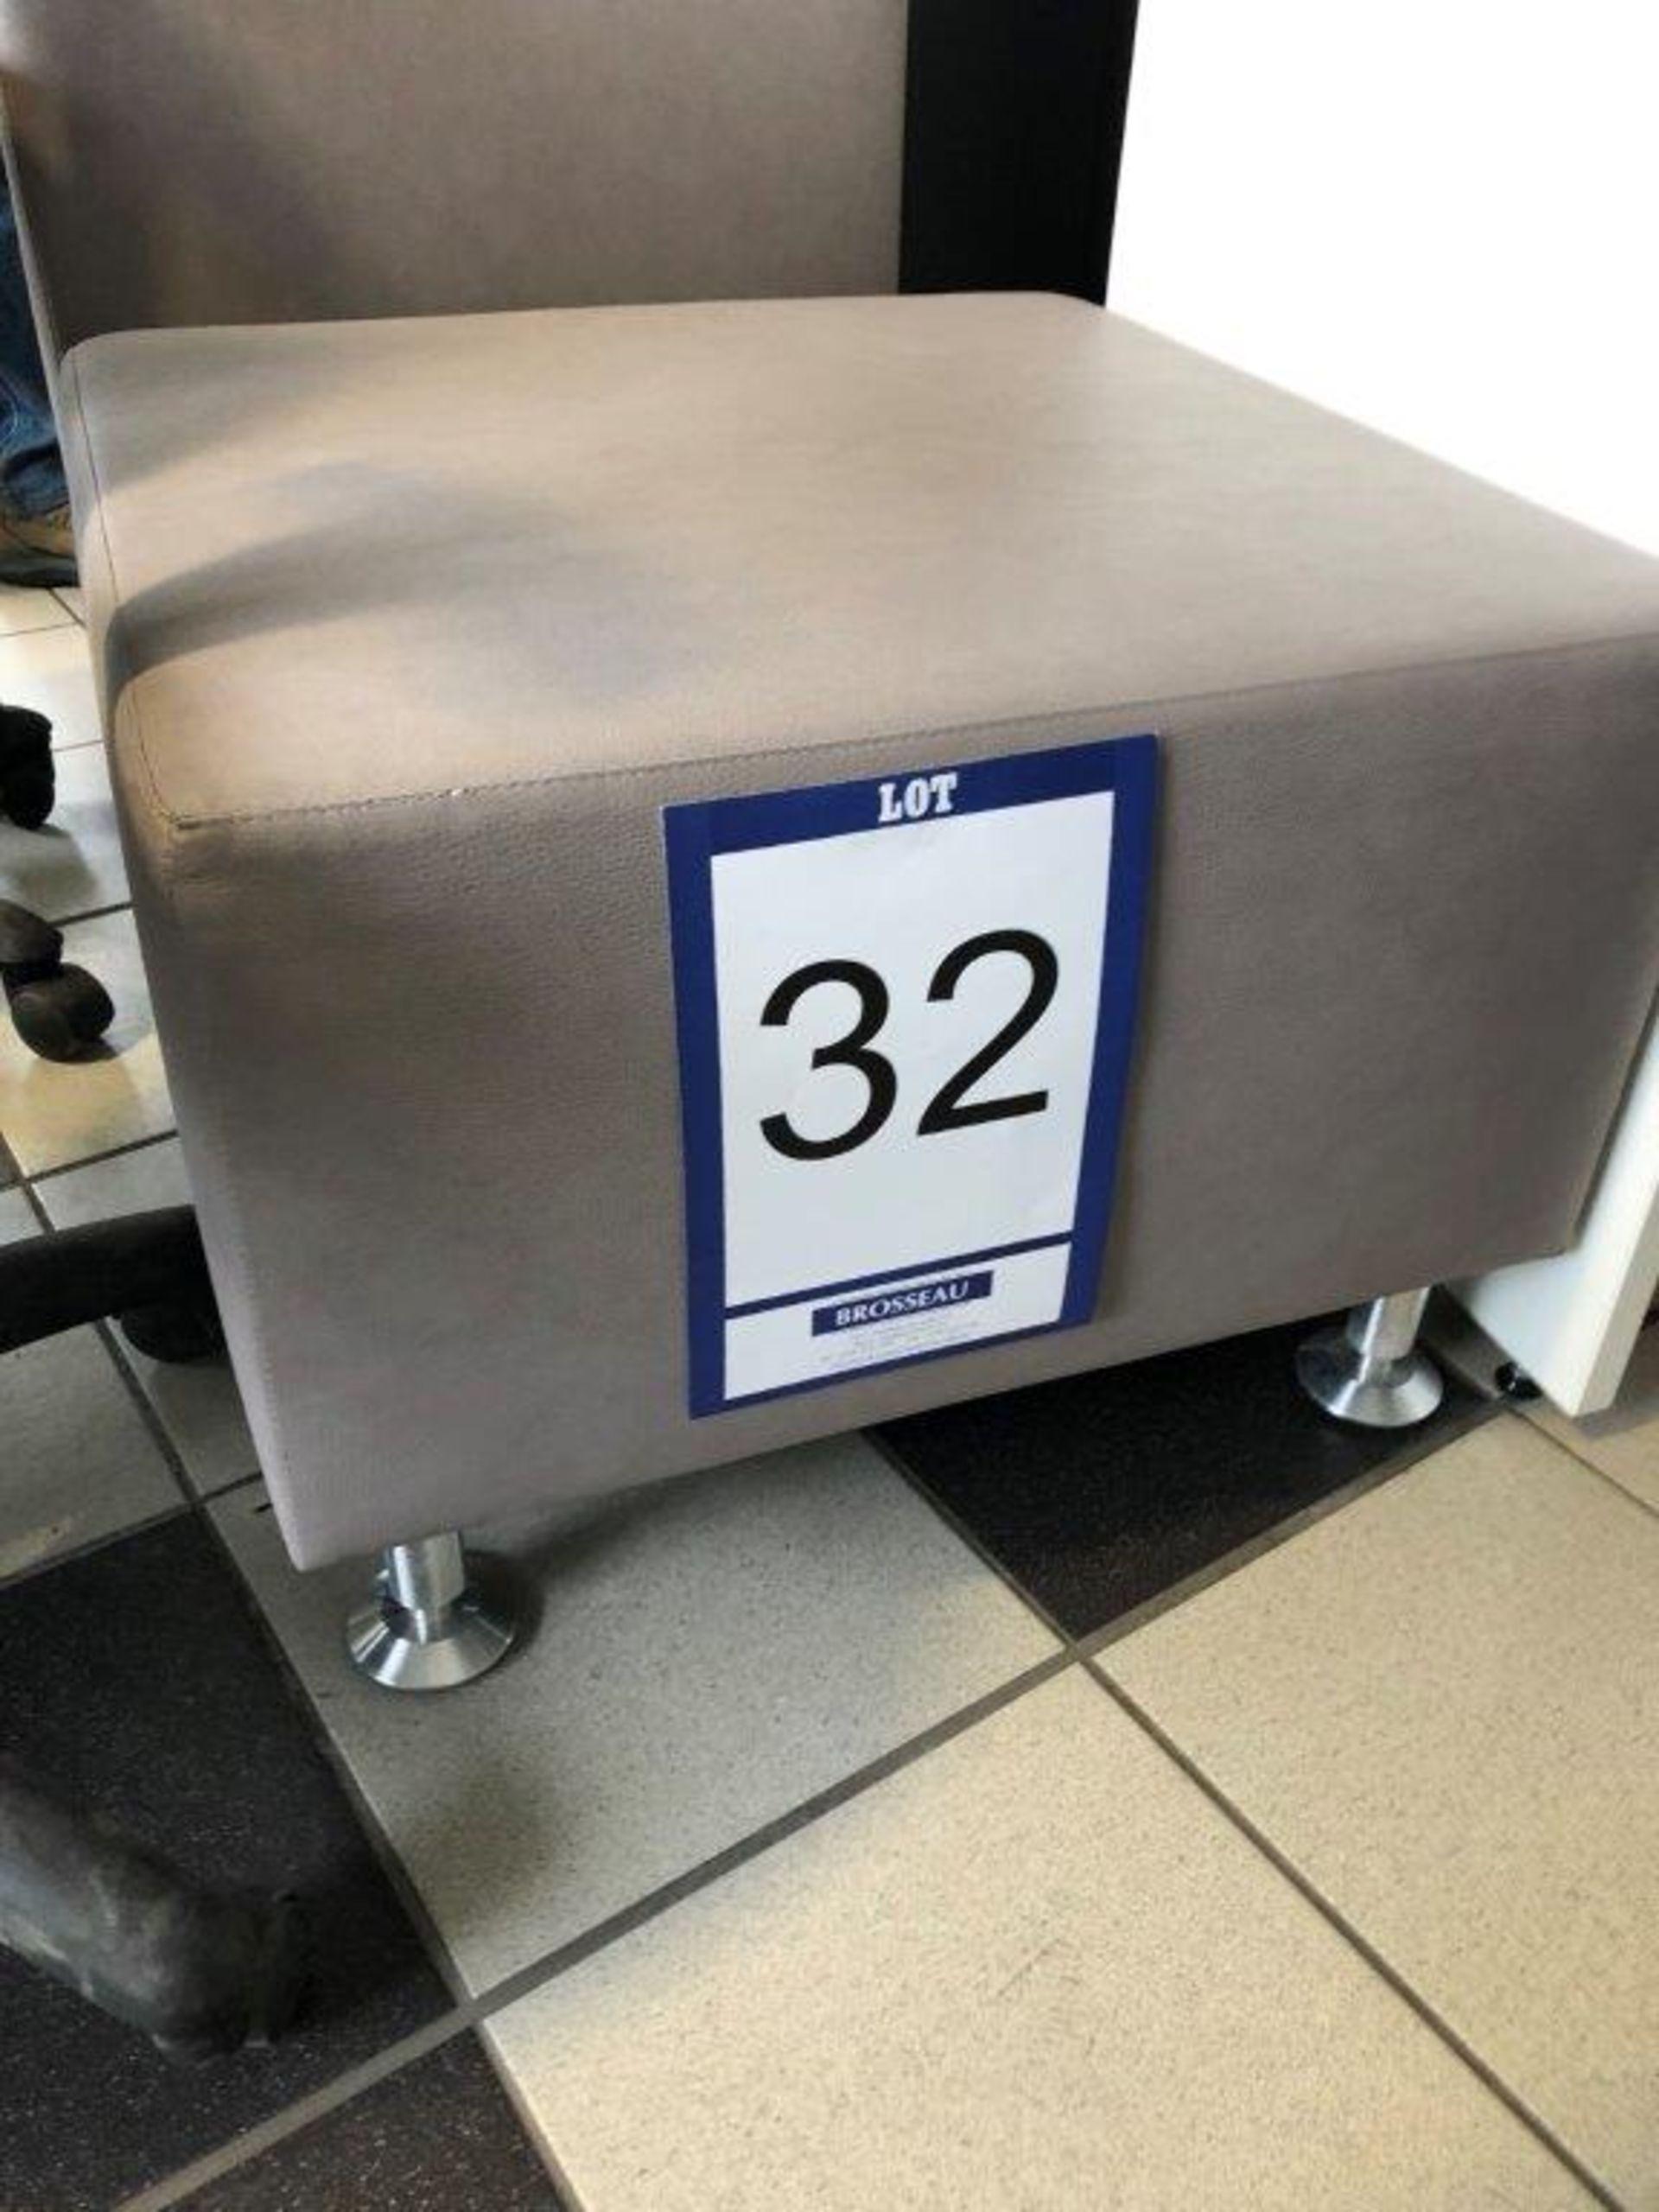 Lot 32 - Lot: 2 poufs en cuirette